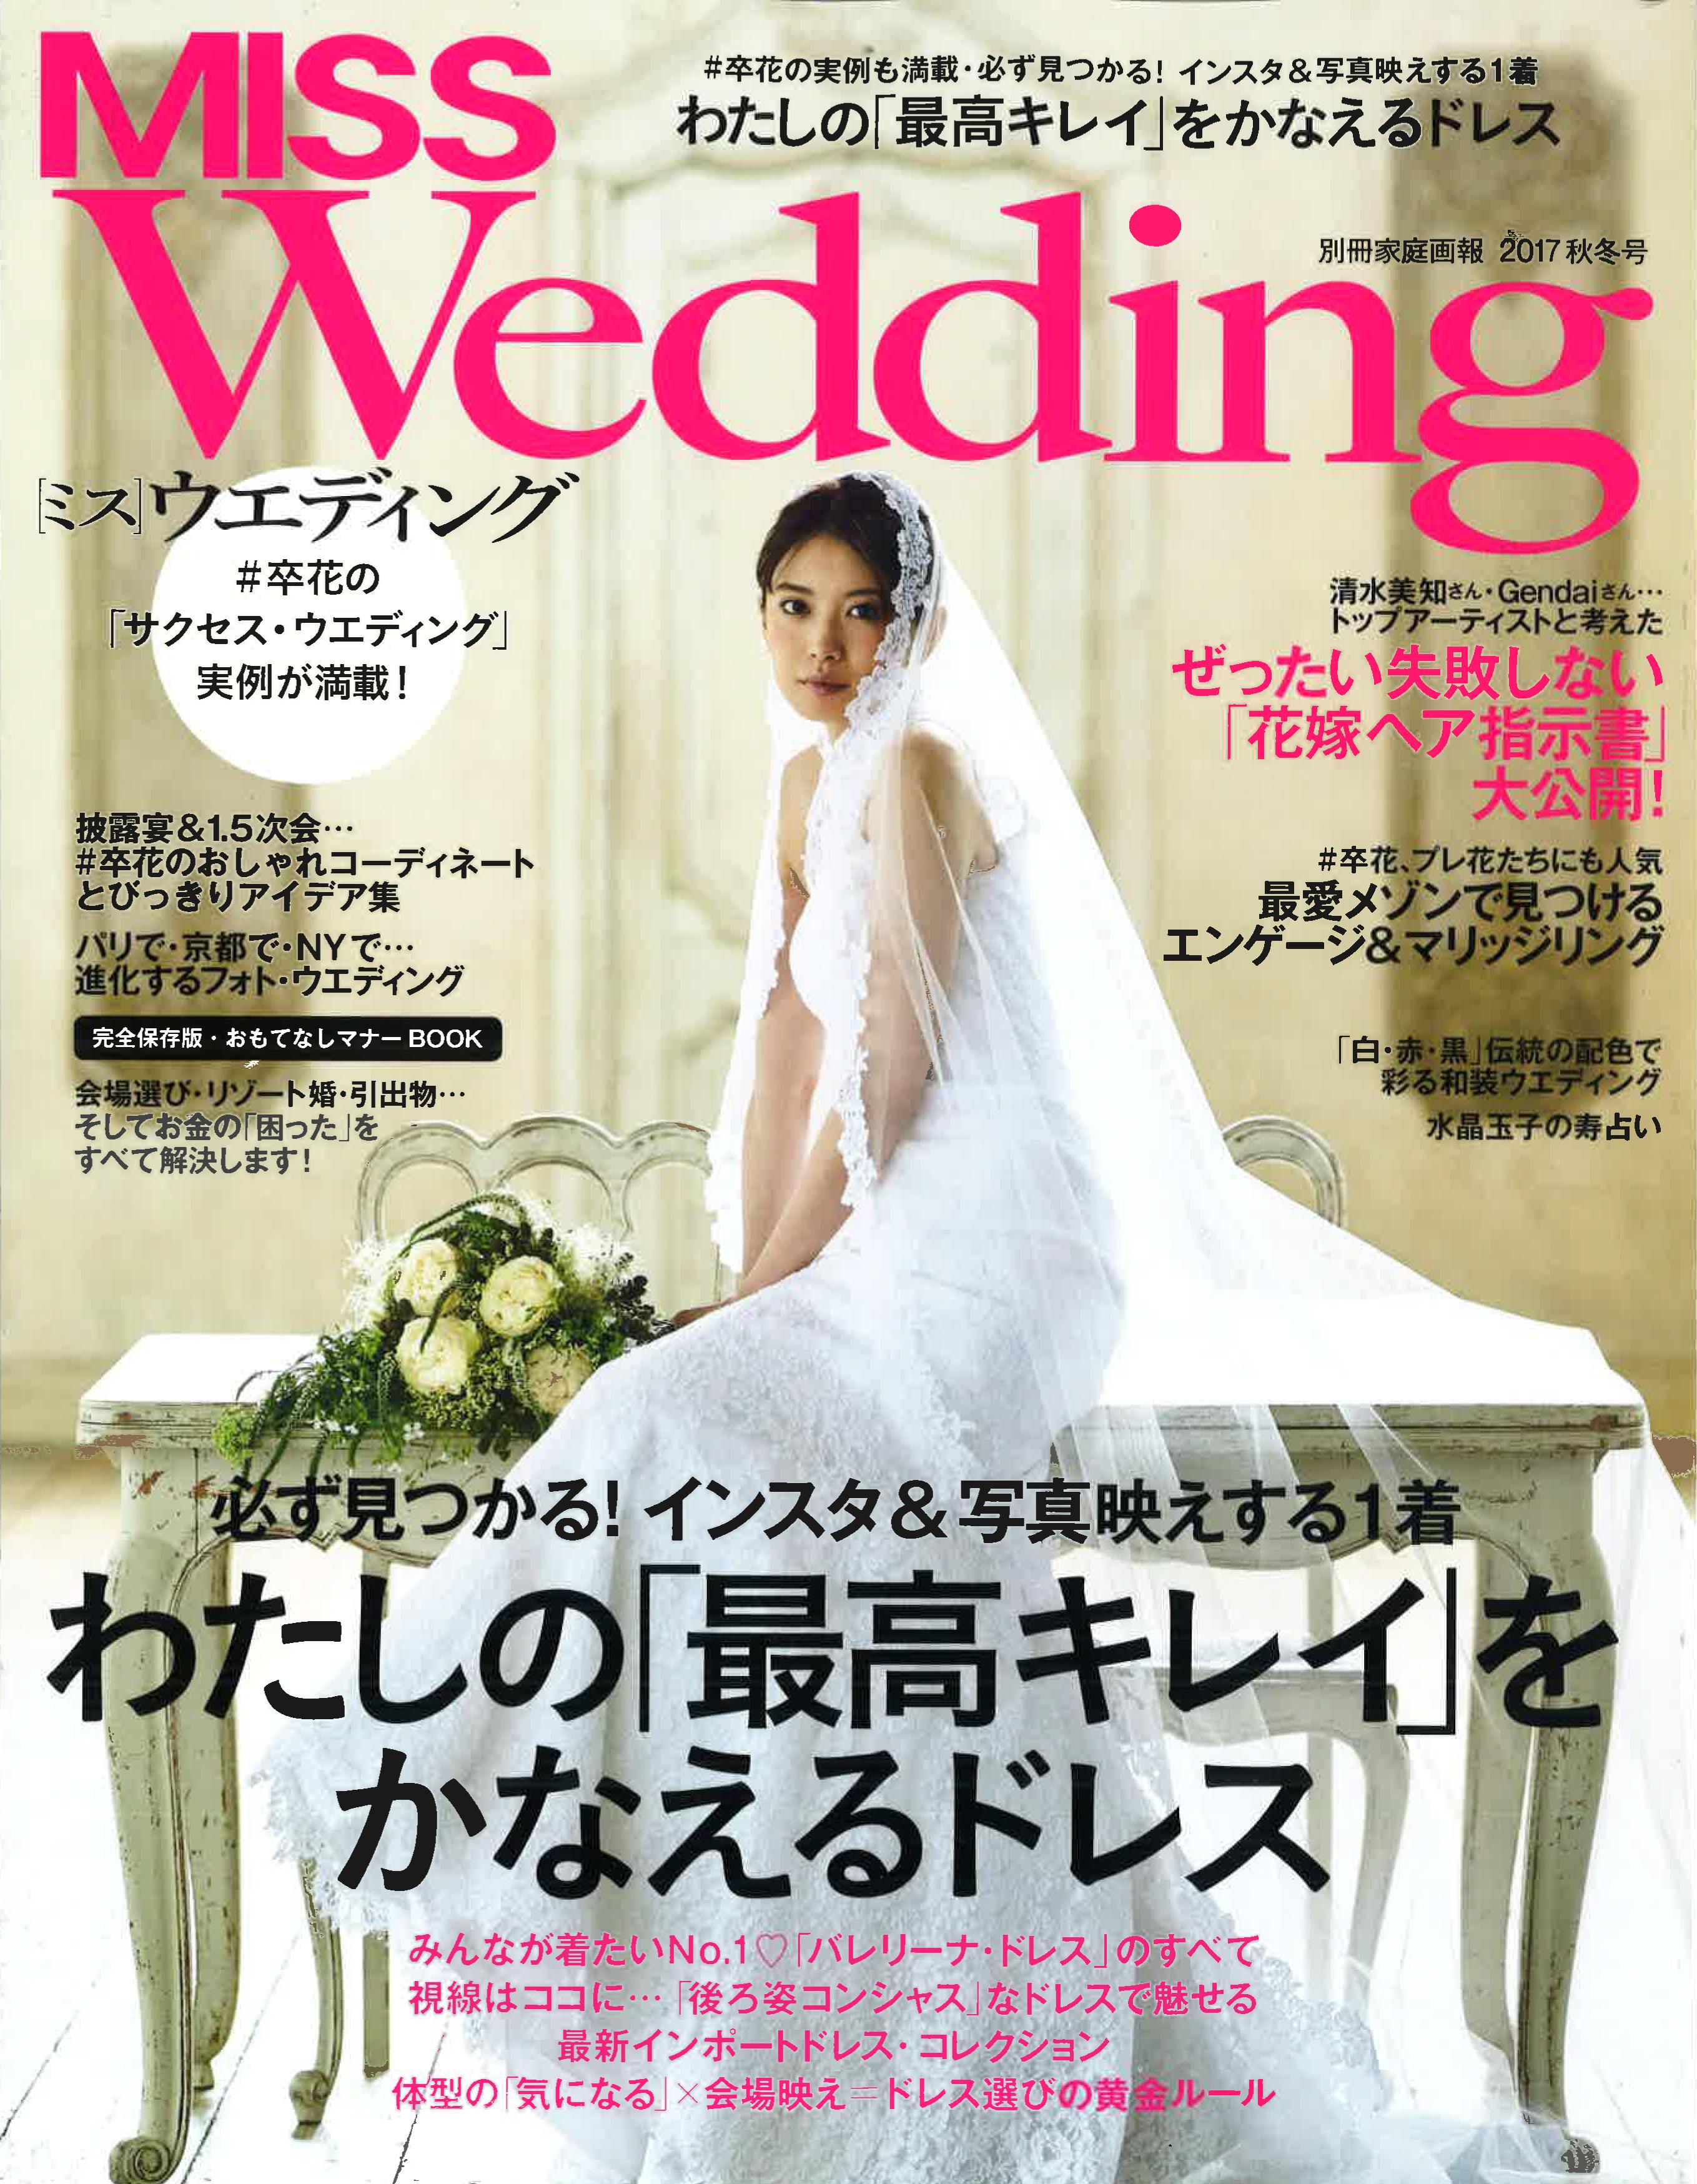 MISS Wedding 2017秋冬号雑誌掲載☆